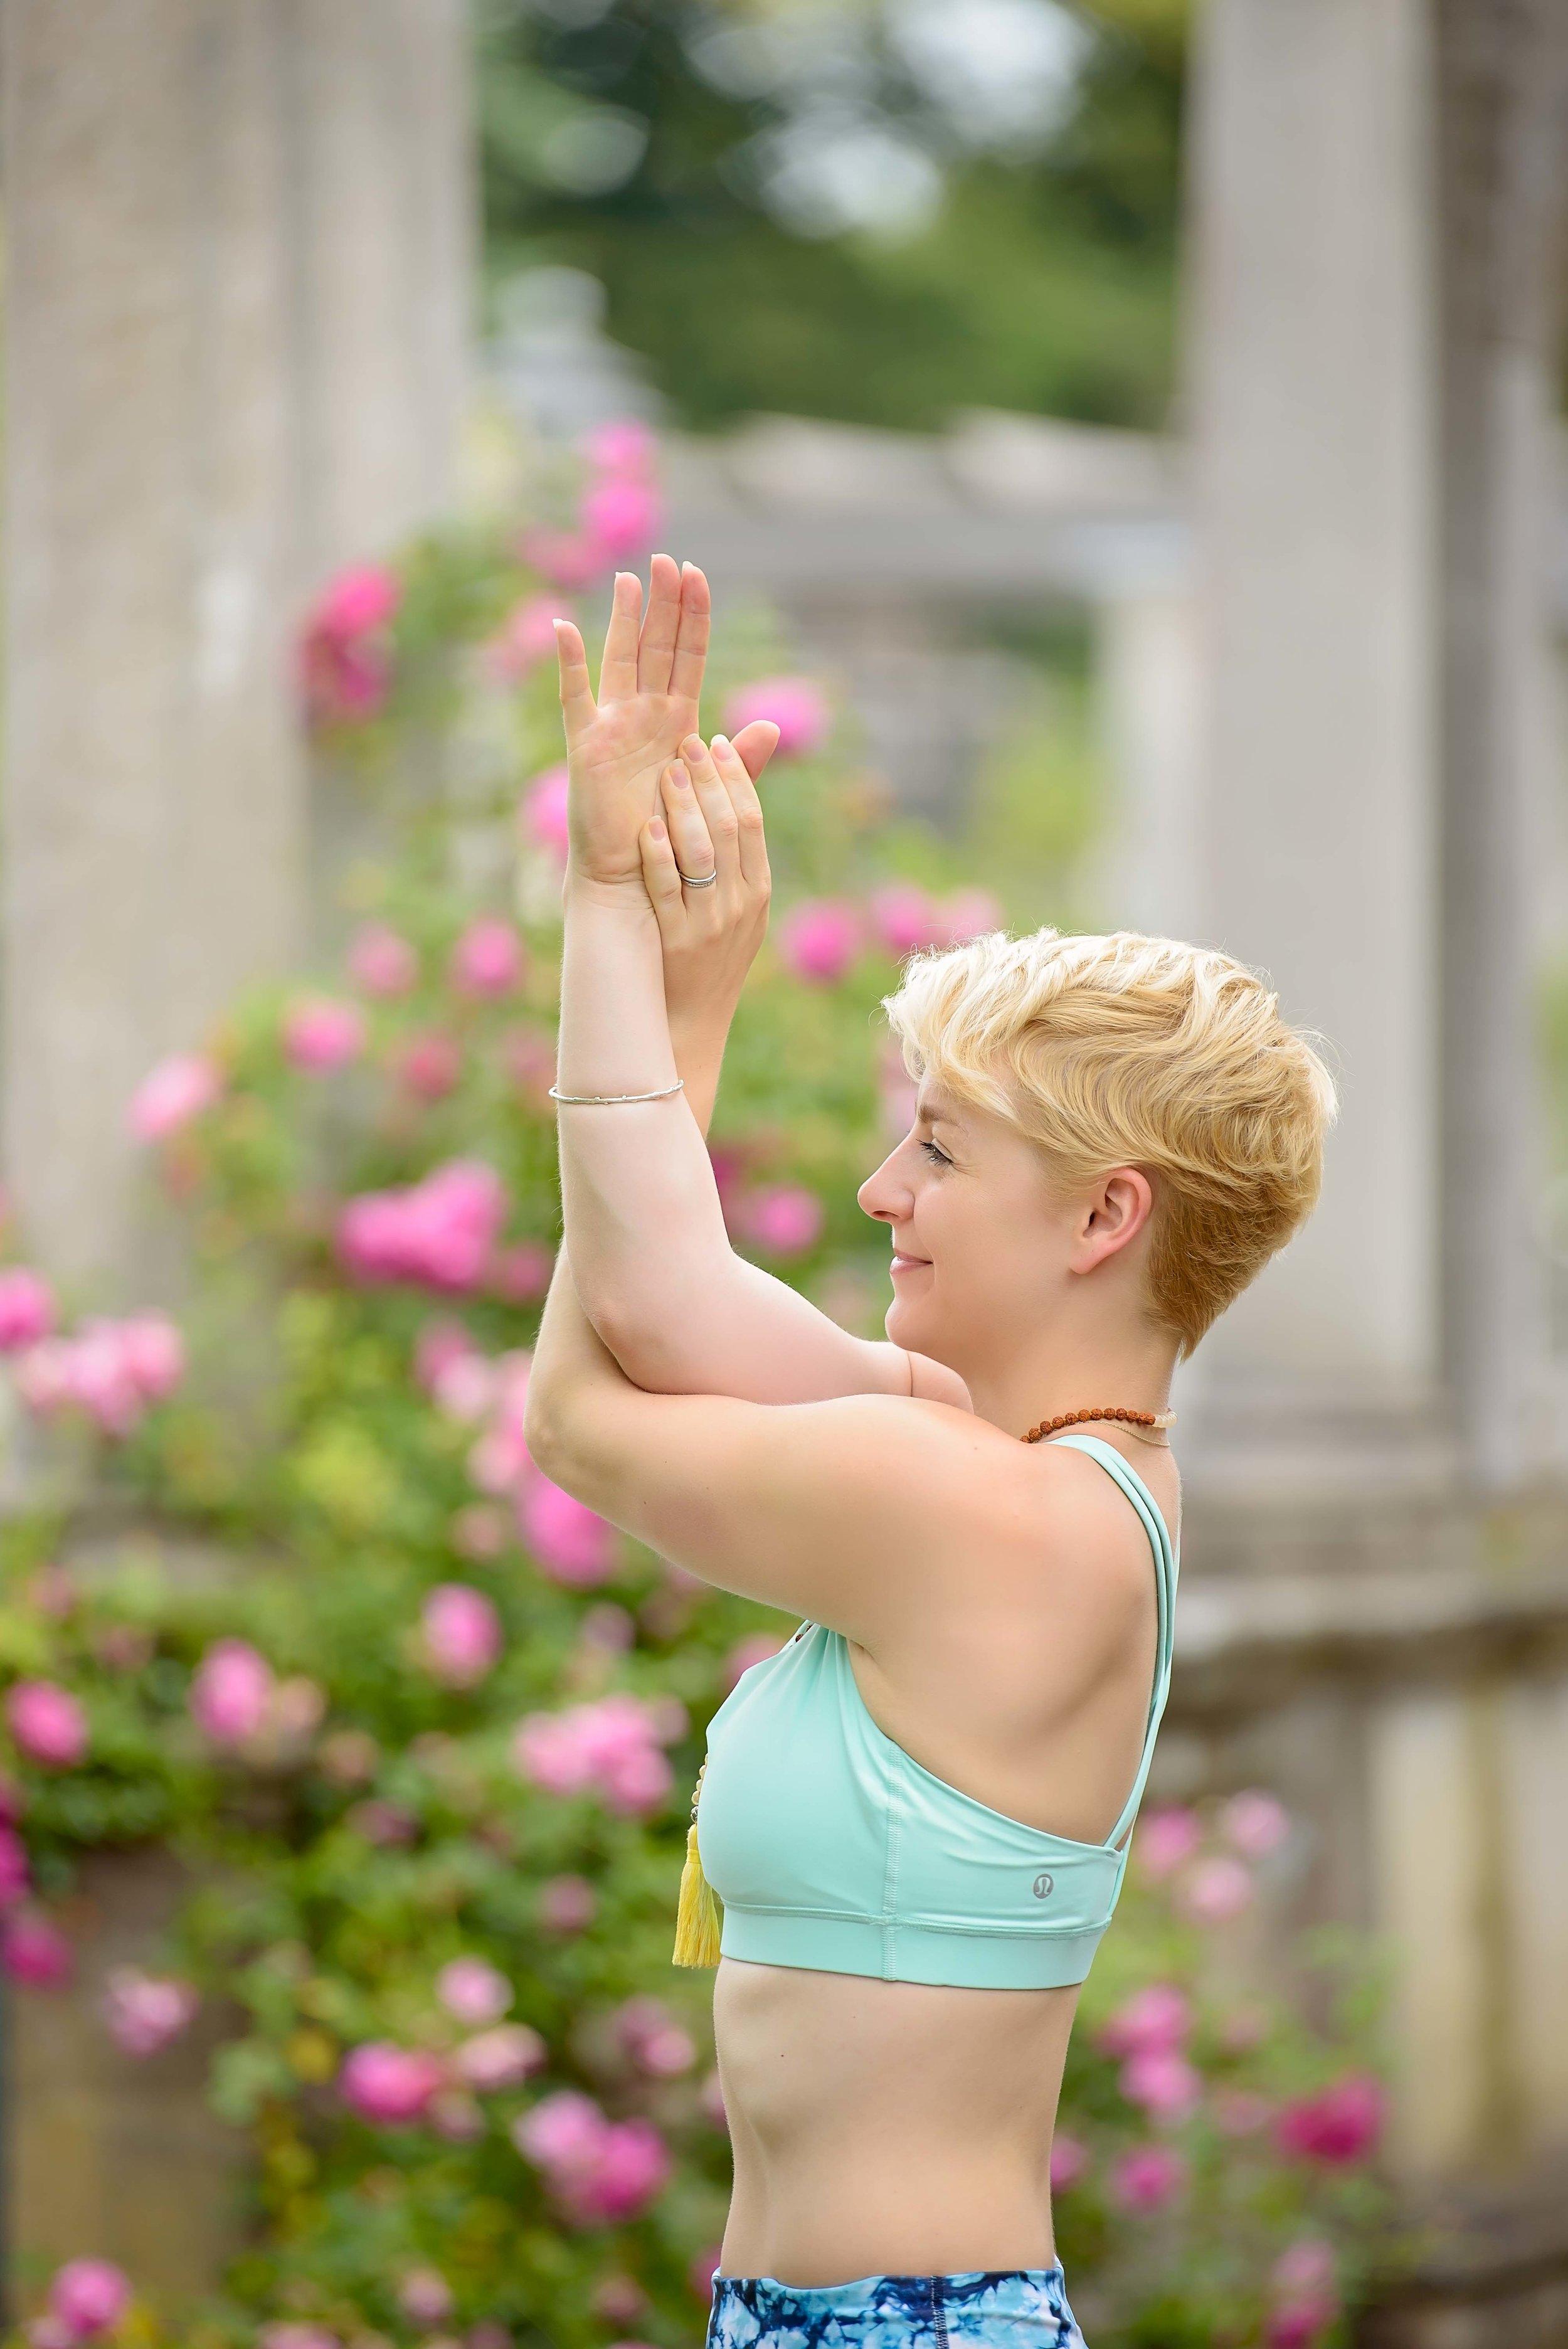 Outdoor yoga photography